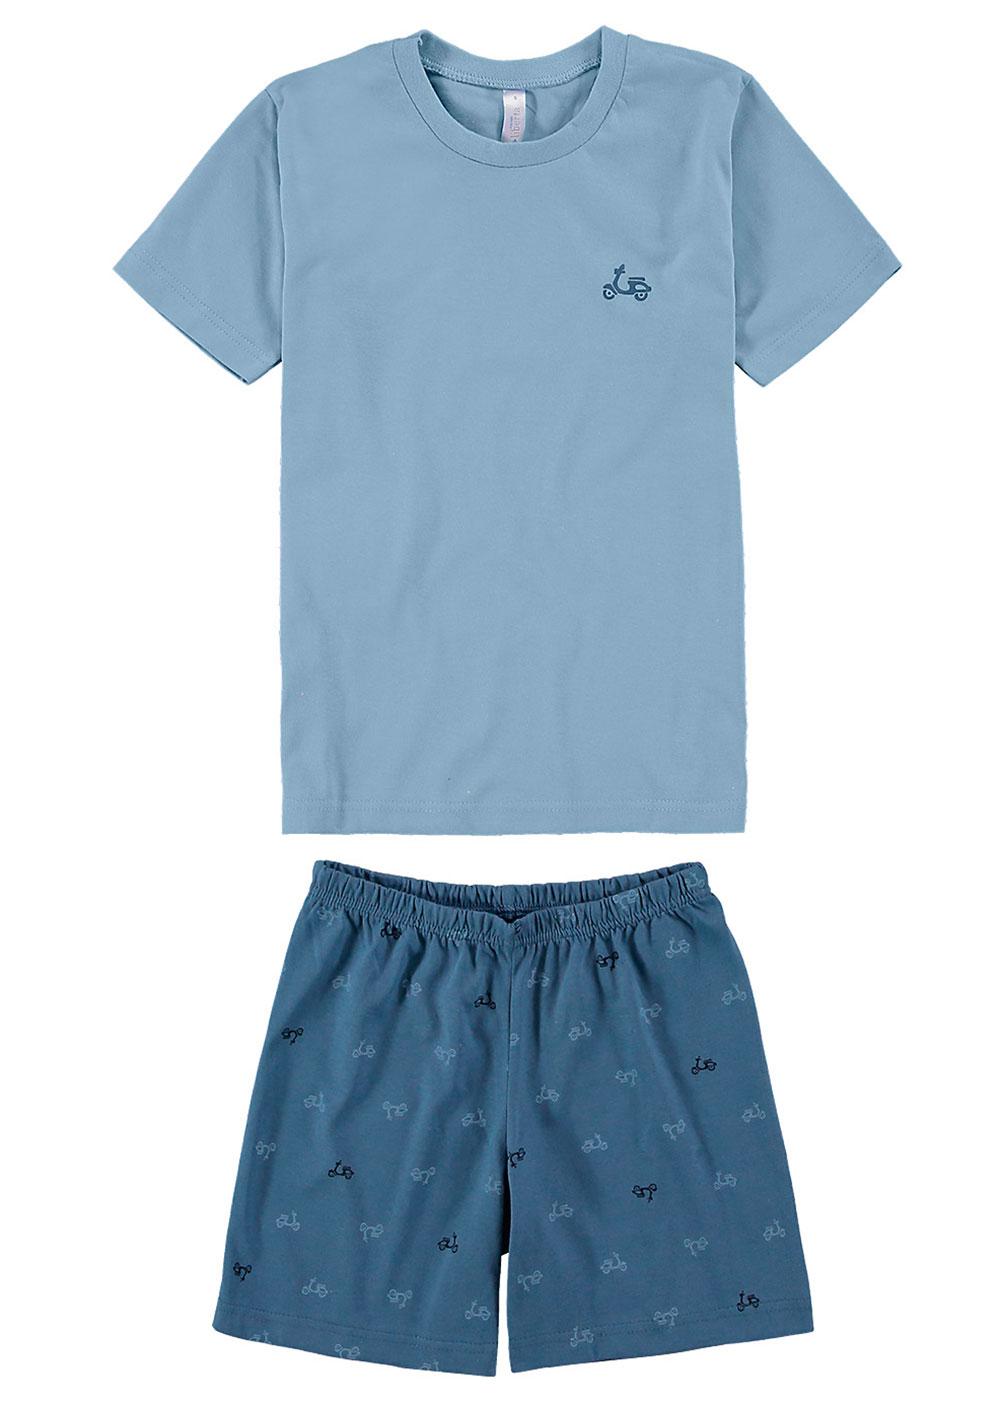 Pijama Infantil Masculino Pai e Filho Azul Malwee